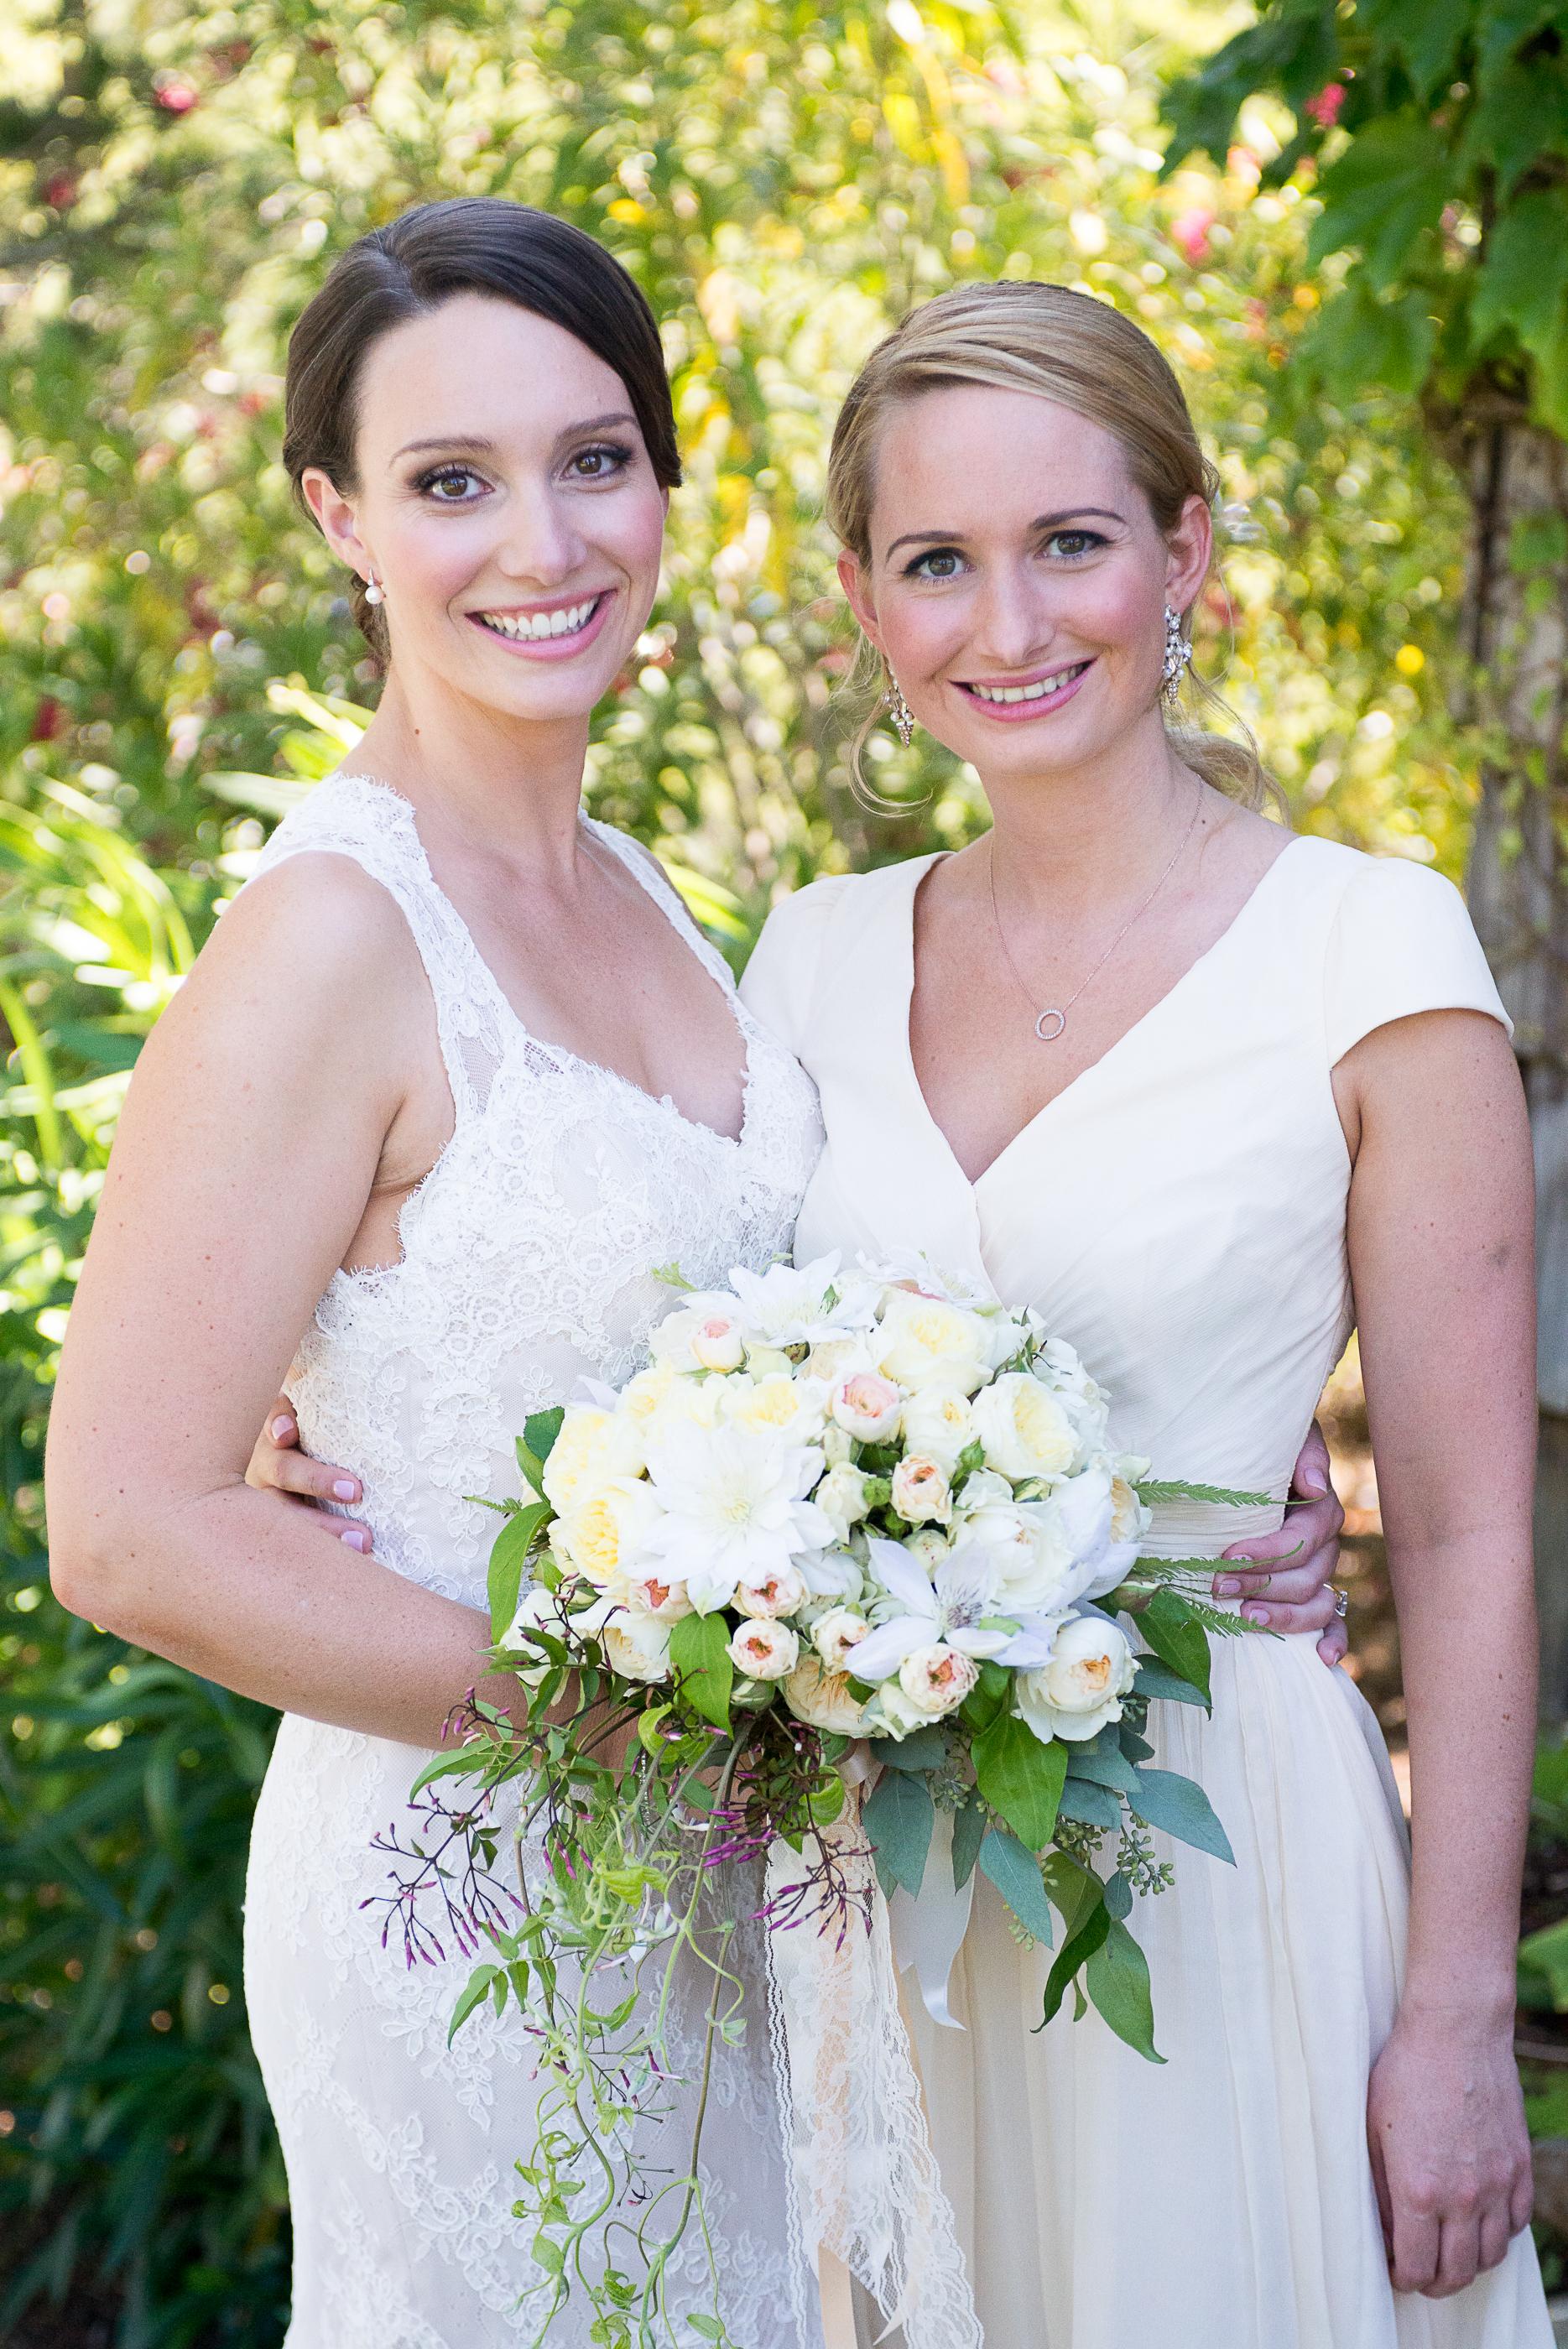 formals_wedding_adler042_0044.jpg